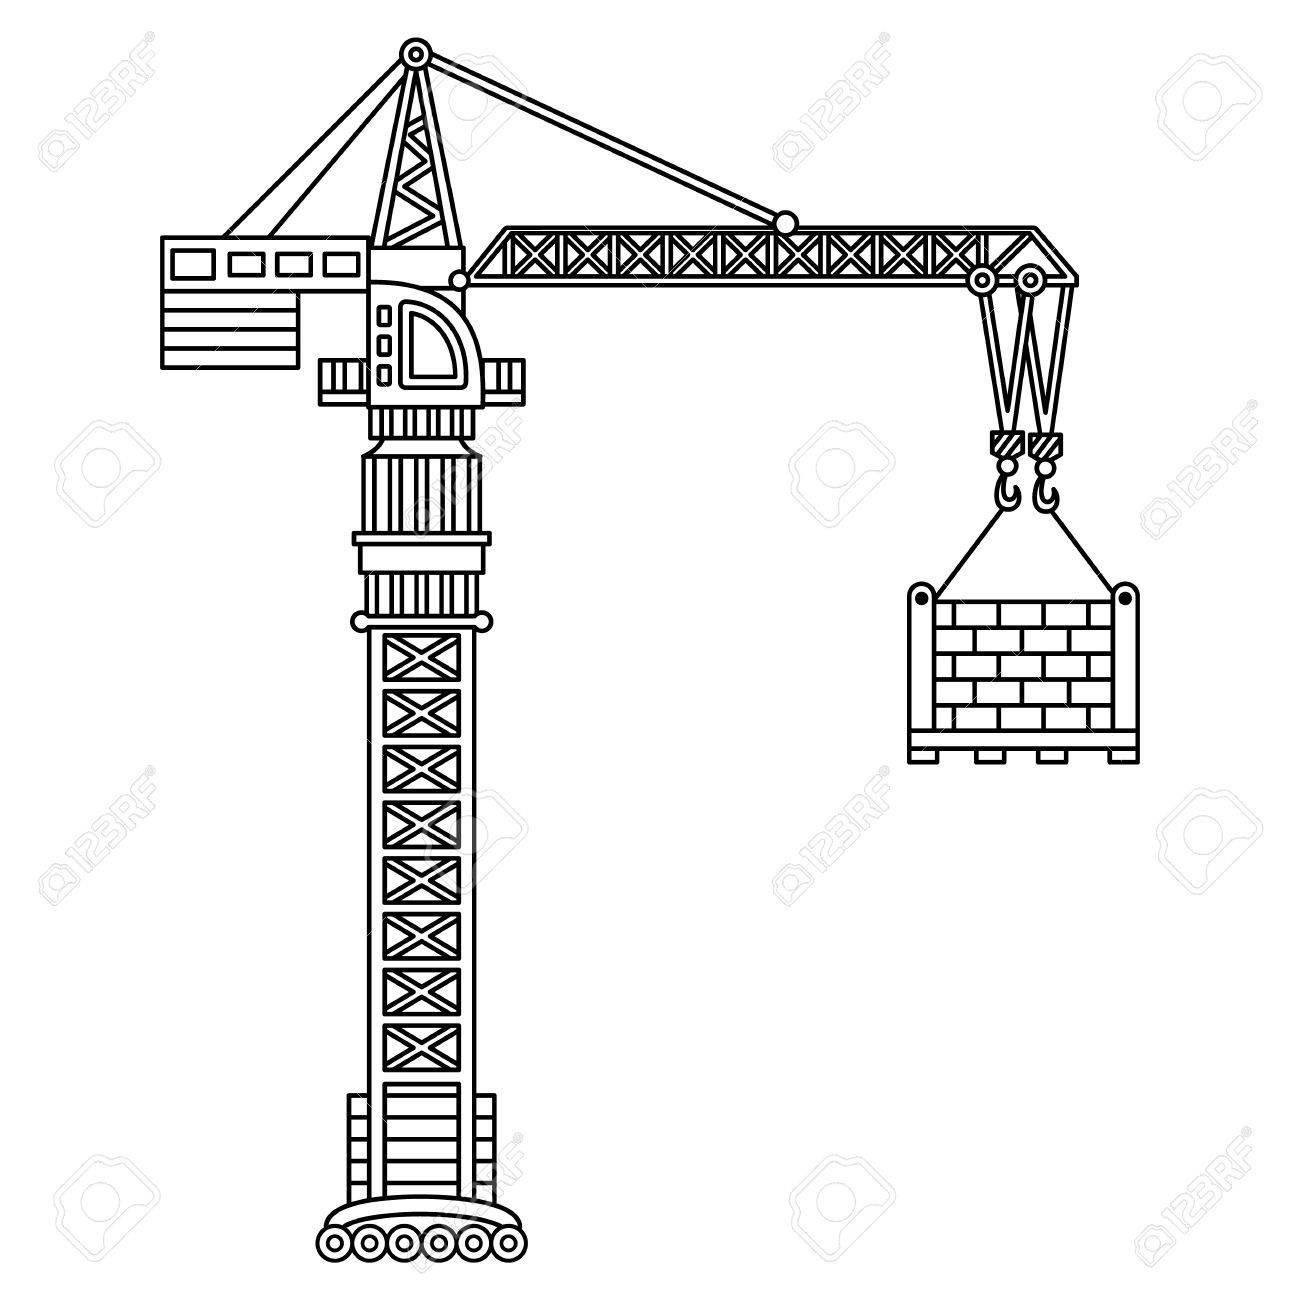 vector construction crane construction machine vector crane Mobile Crane Diagram vector construction crane construction machine vector crane stock vector 81054797